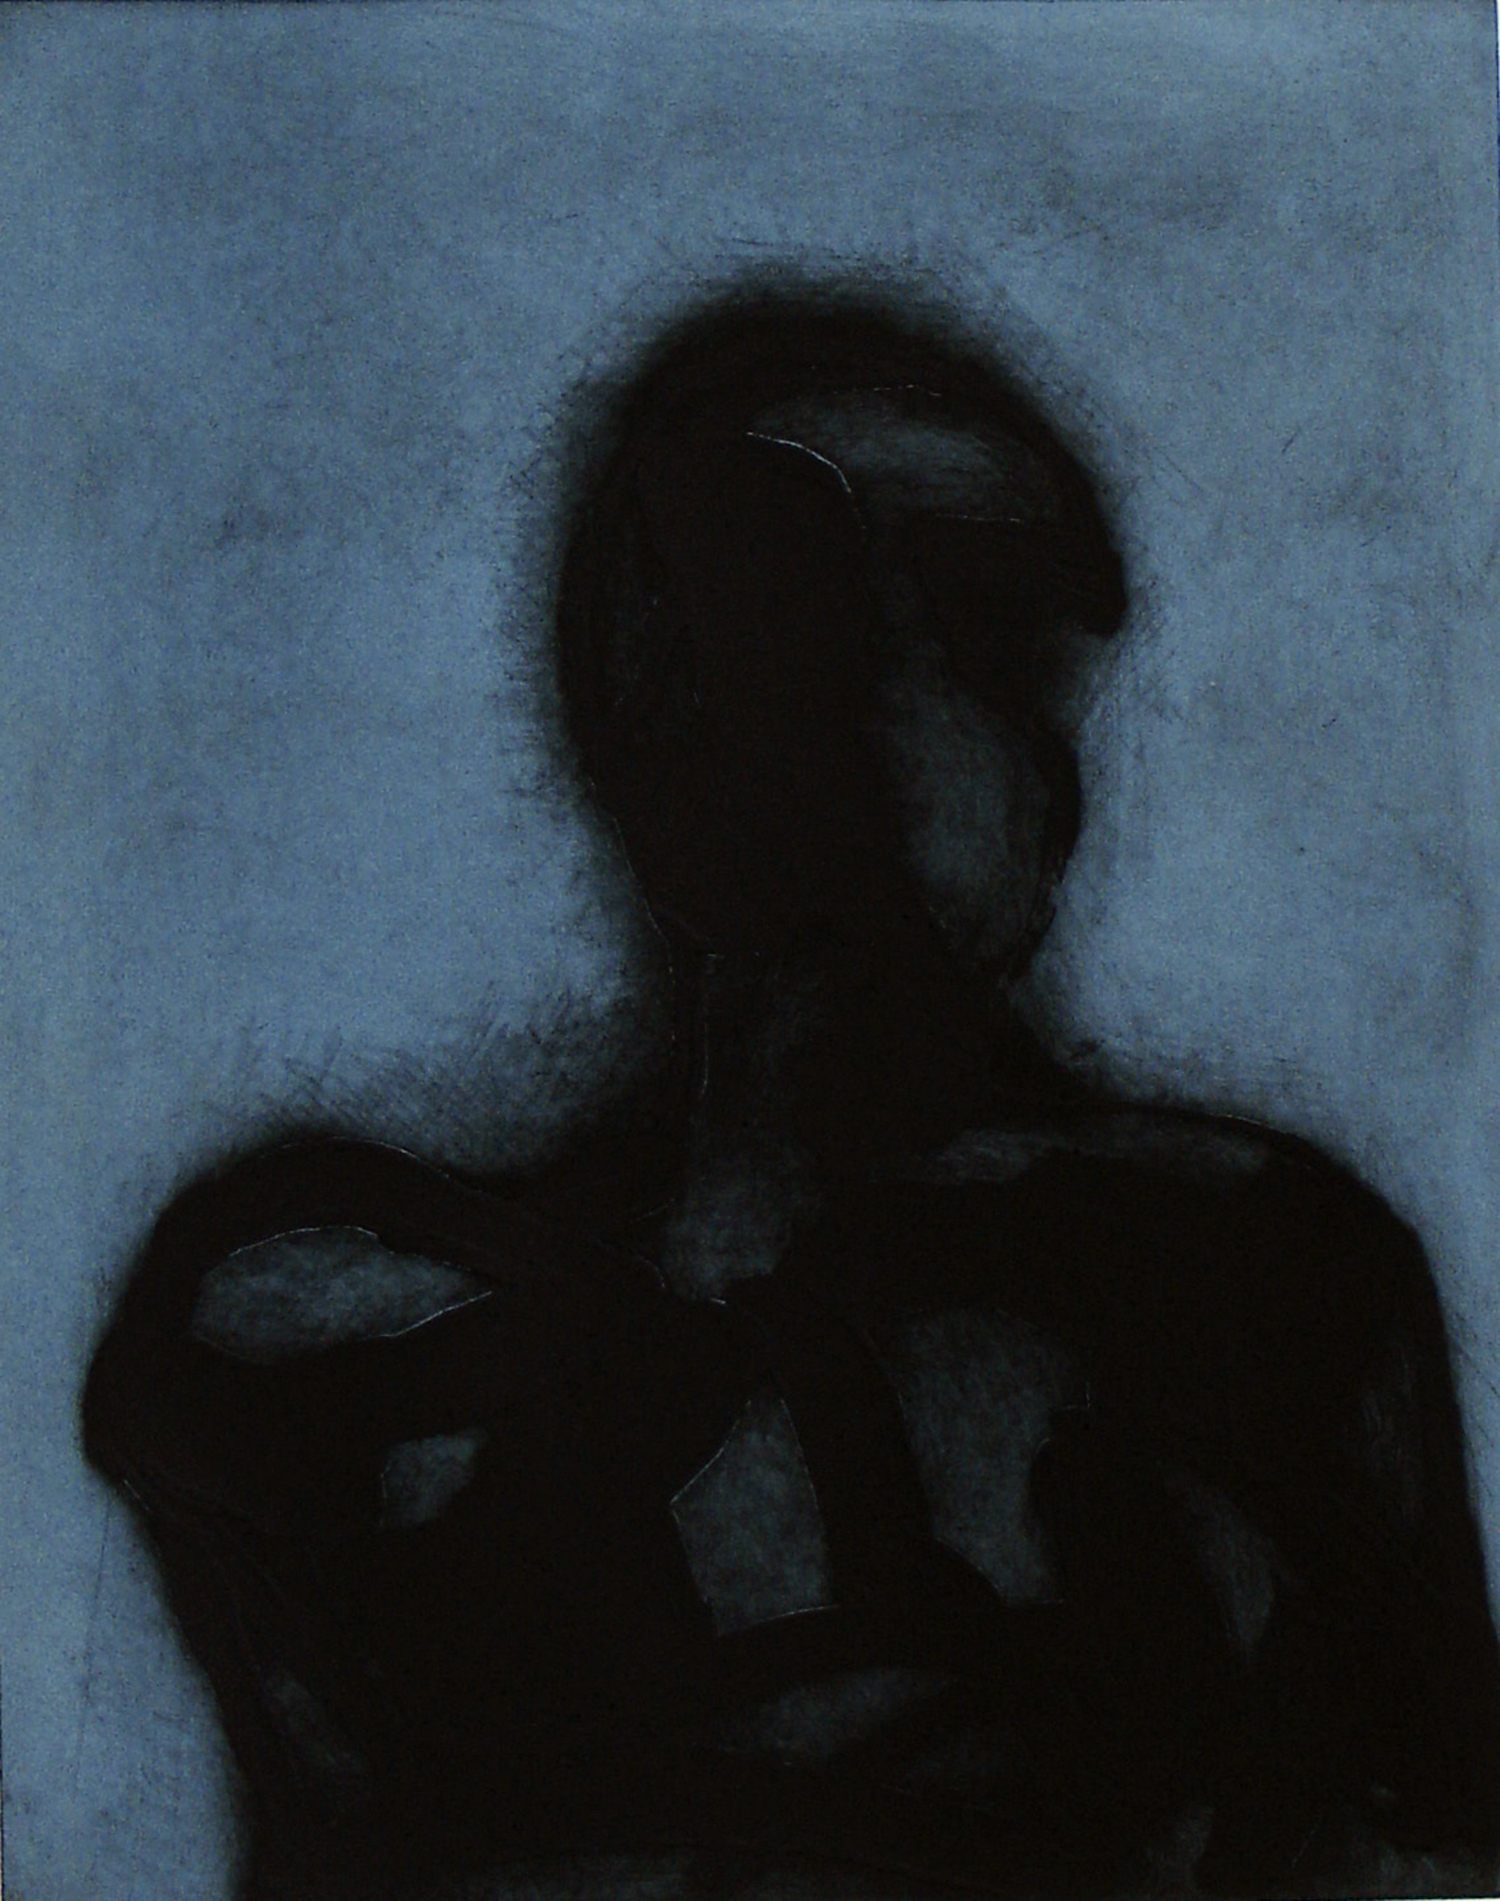 Peter Griffin, Blue Carborundum    Date:  2007   Size (cm - unframed):  76 x 55   Technique:  Carborundum Etching & Screenprint   Materials:  Moulin Du Gue 300gsm   Edition size:  5   Publisher:  The Artist   Copyright:  The Artist    P.O.A.